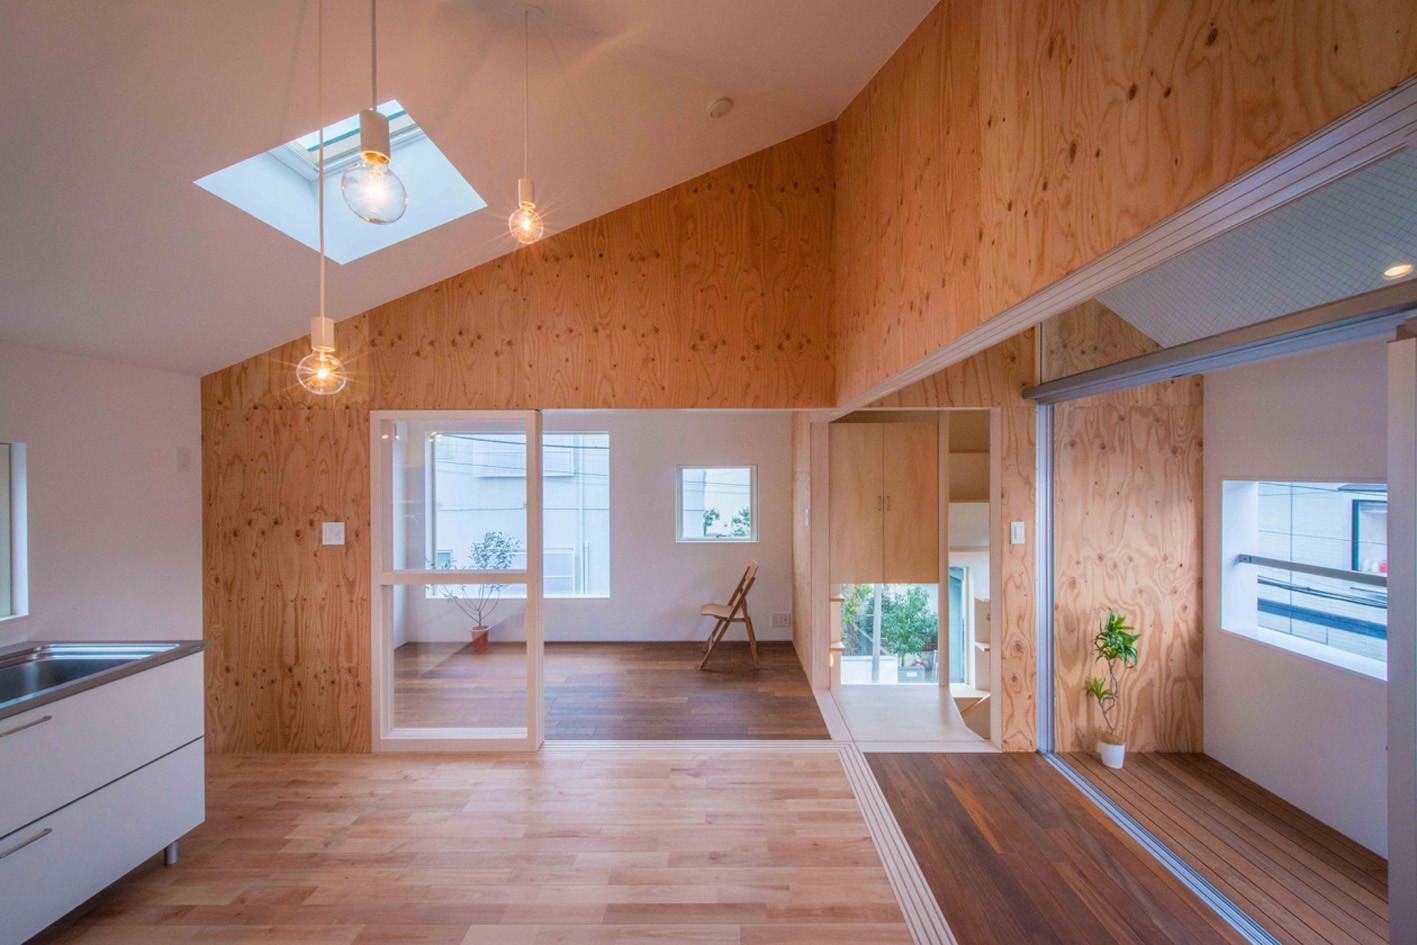 House in Kitakarasuyama / Mizuishi Architect Atelier, © Hiroshi Tanigawa